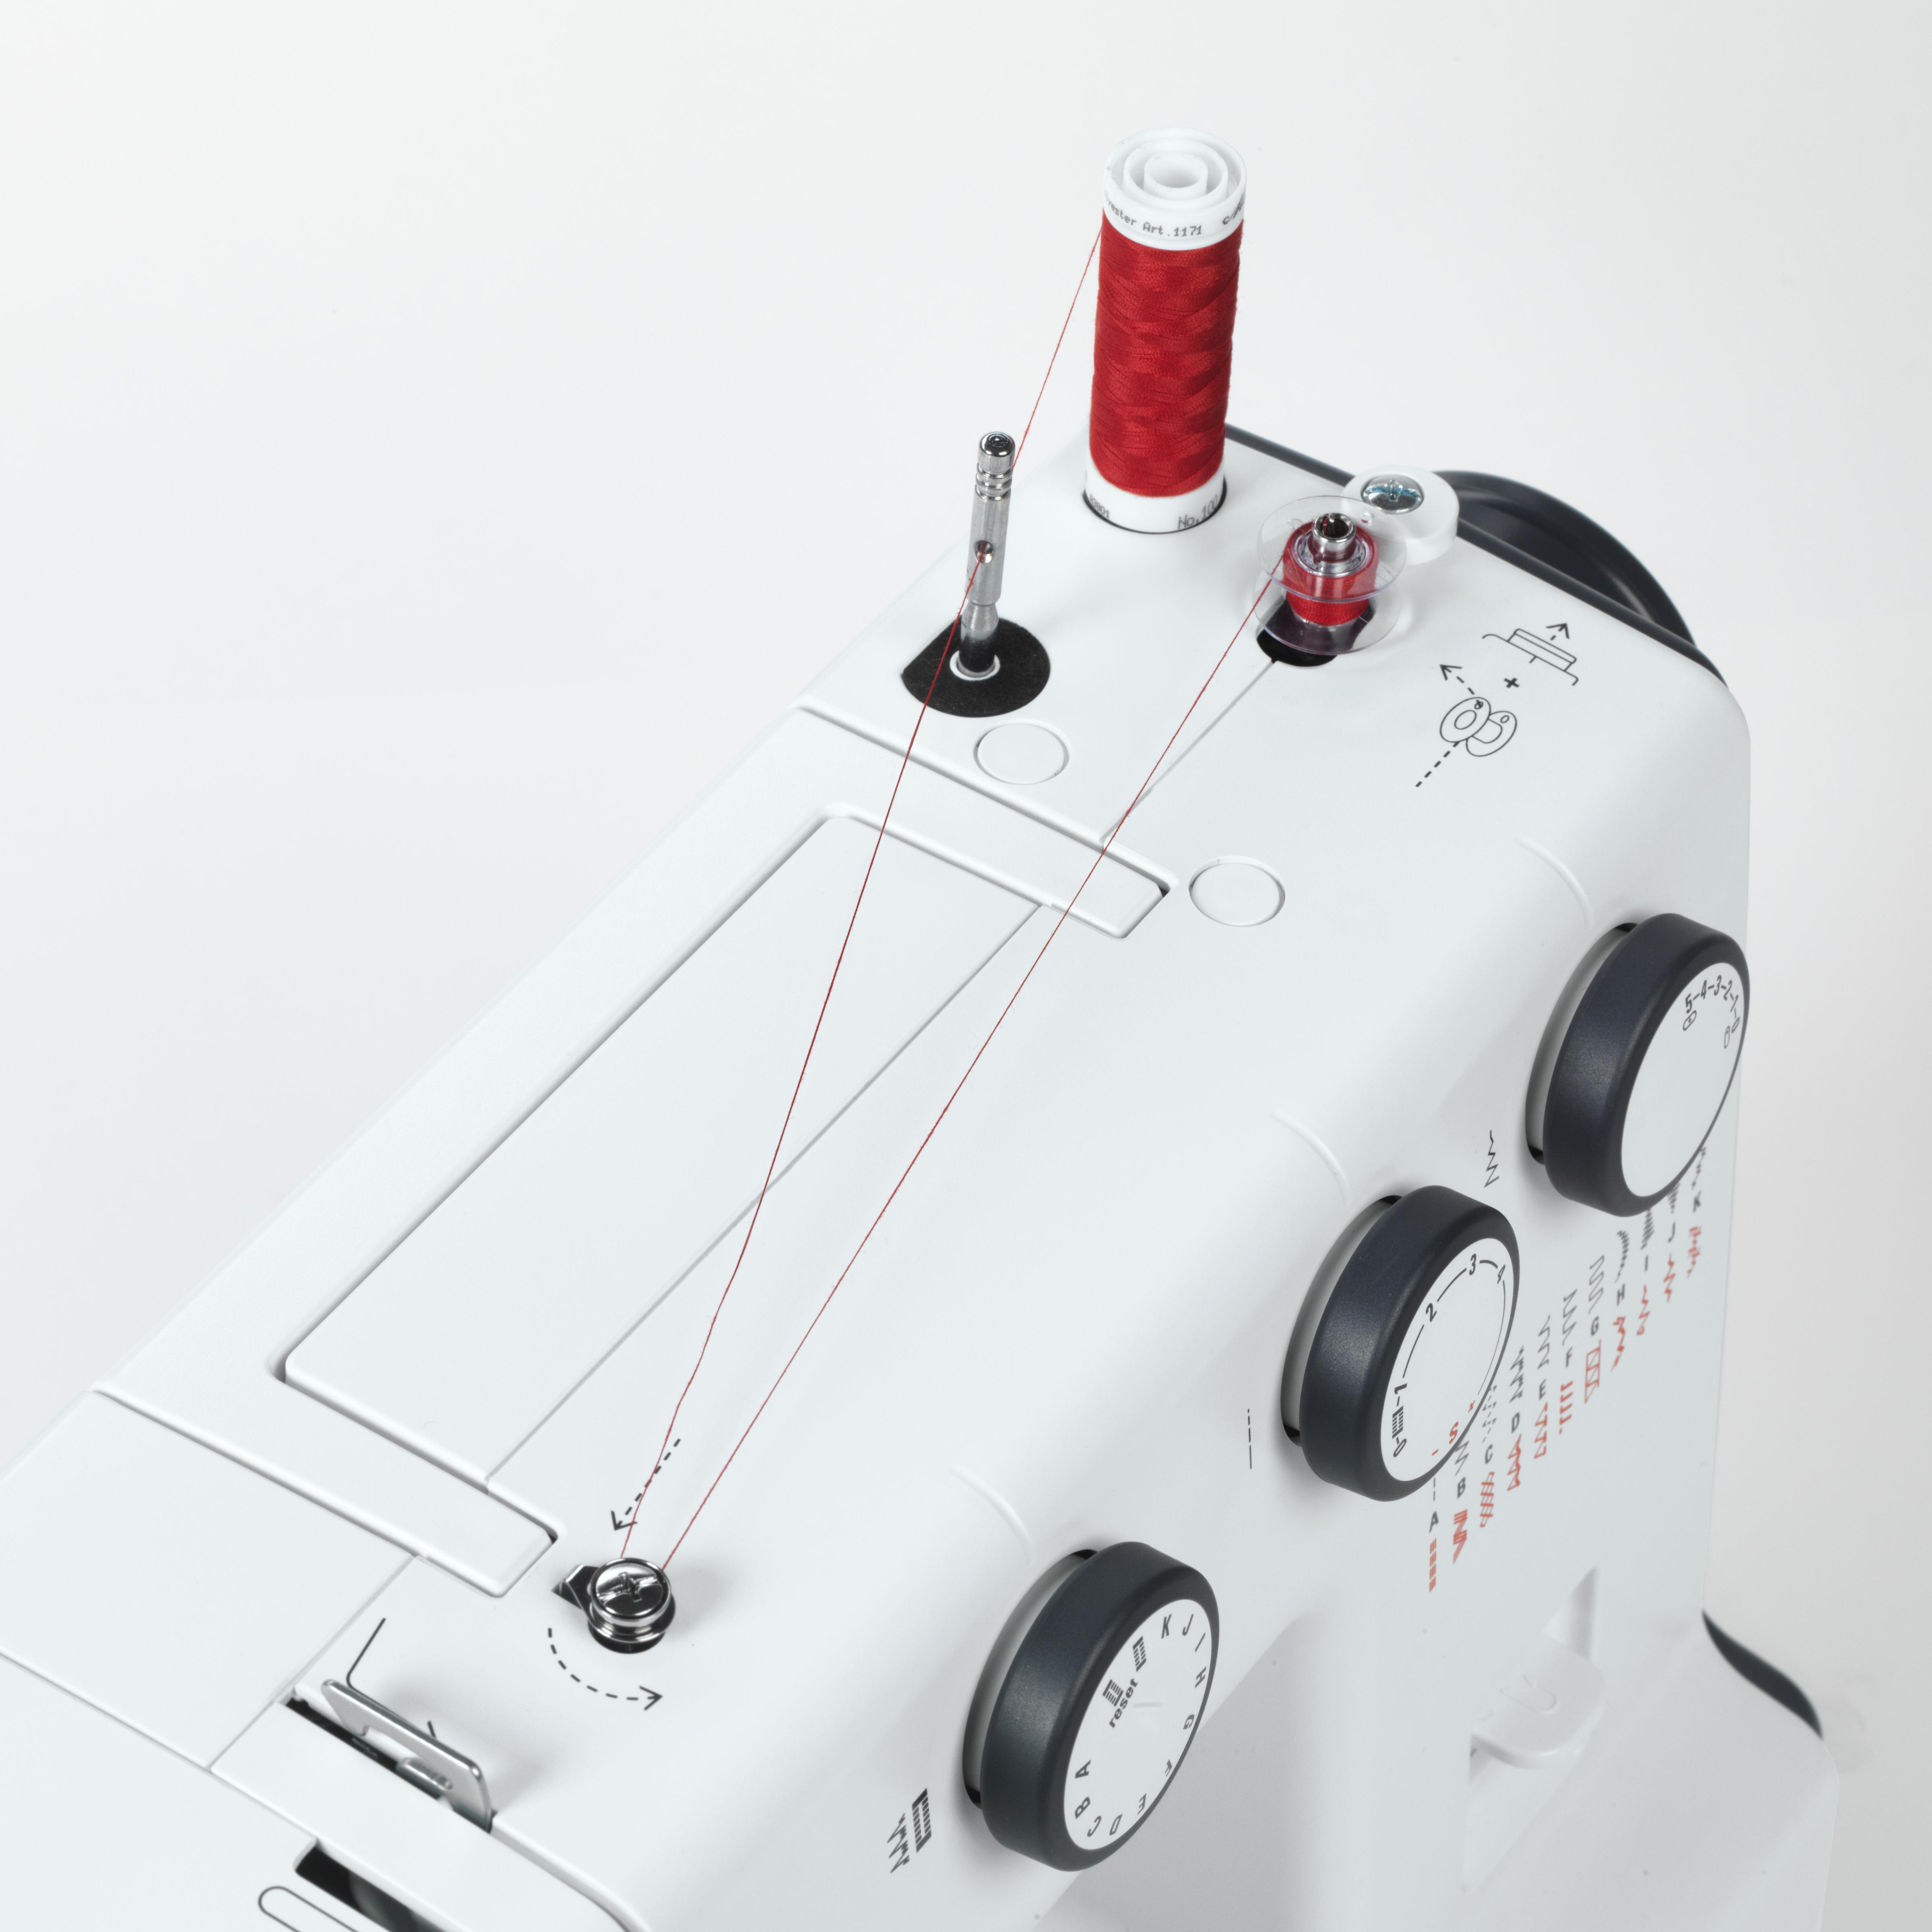 bernette-35-Spulenfuehrung